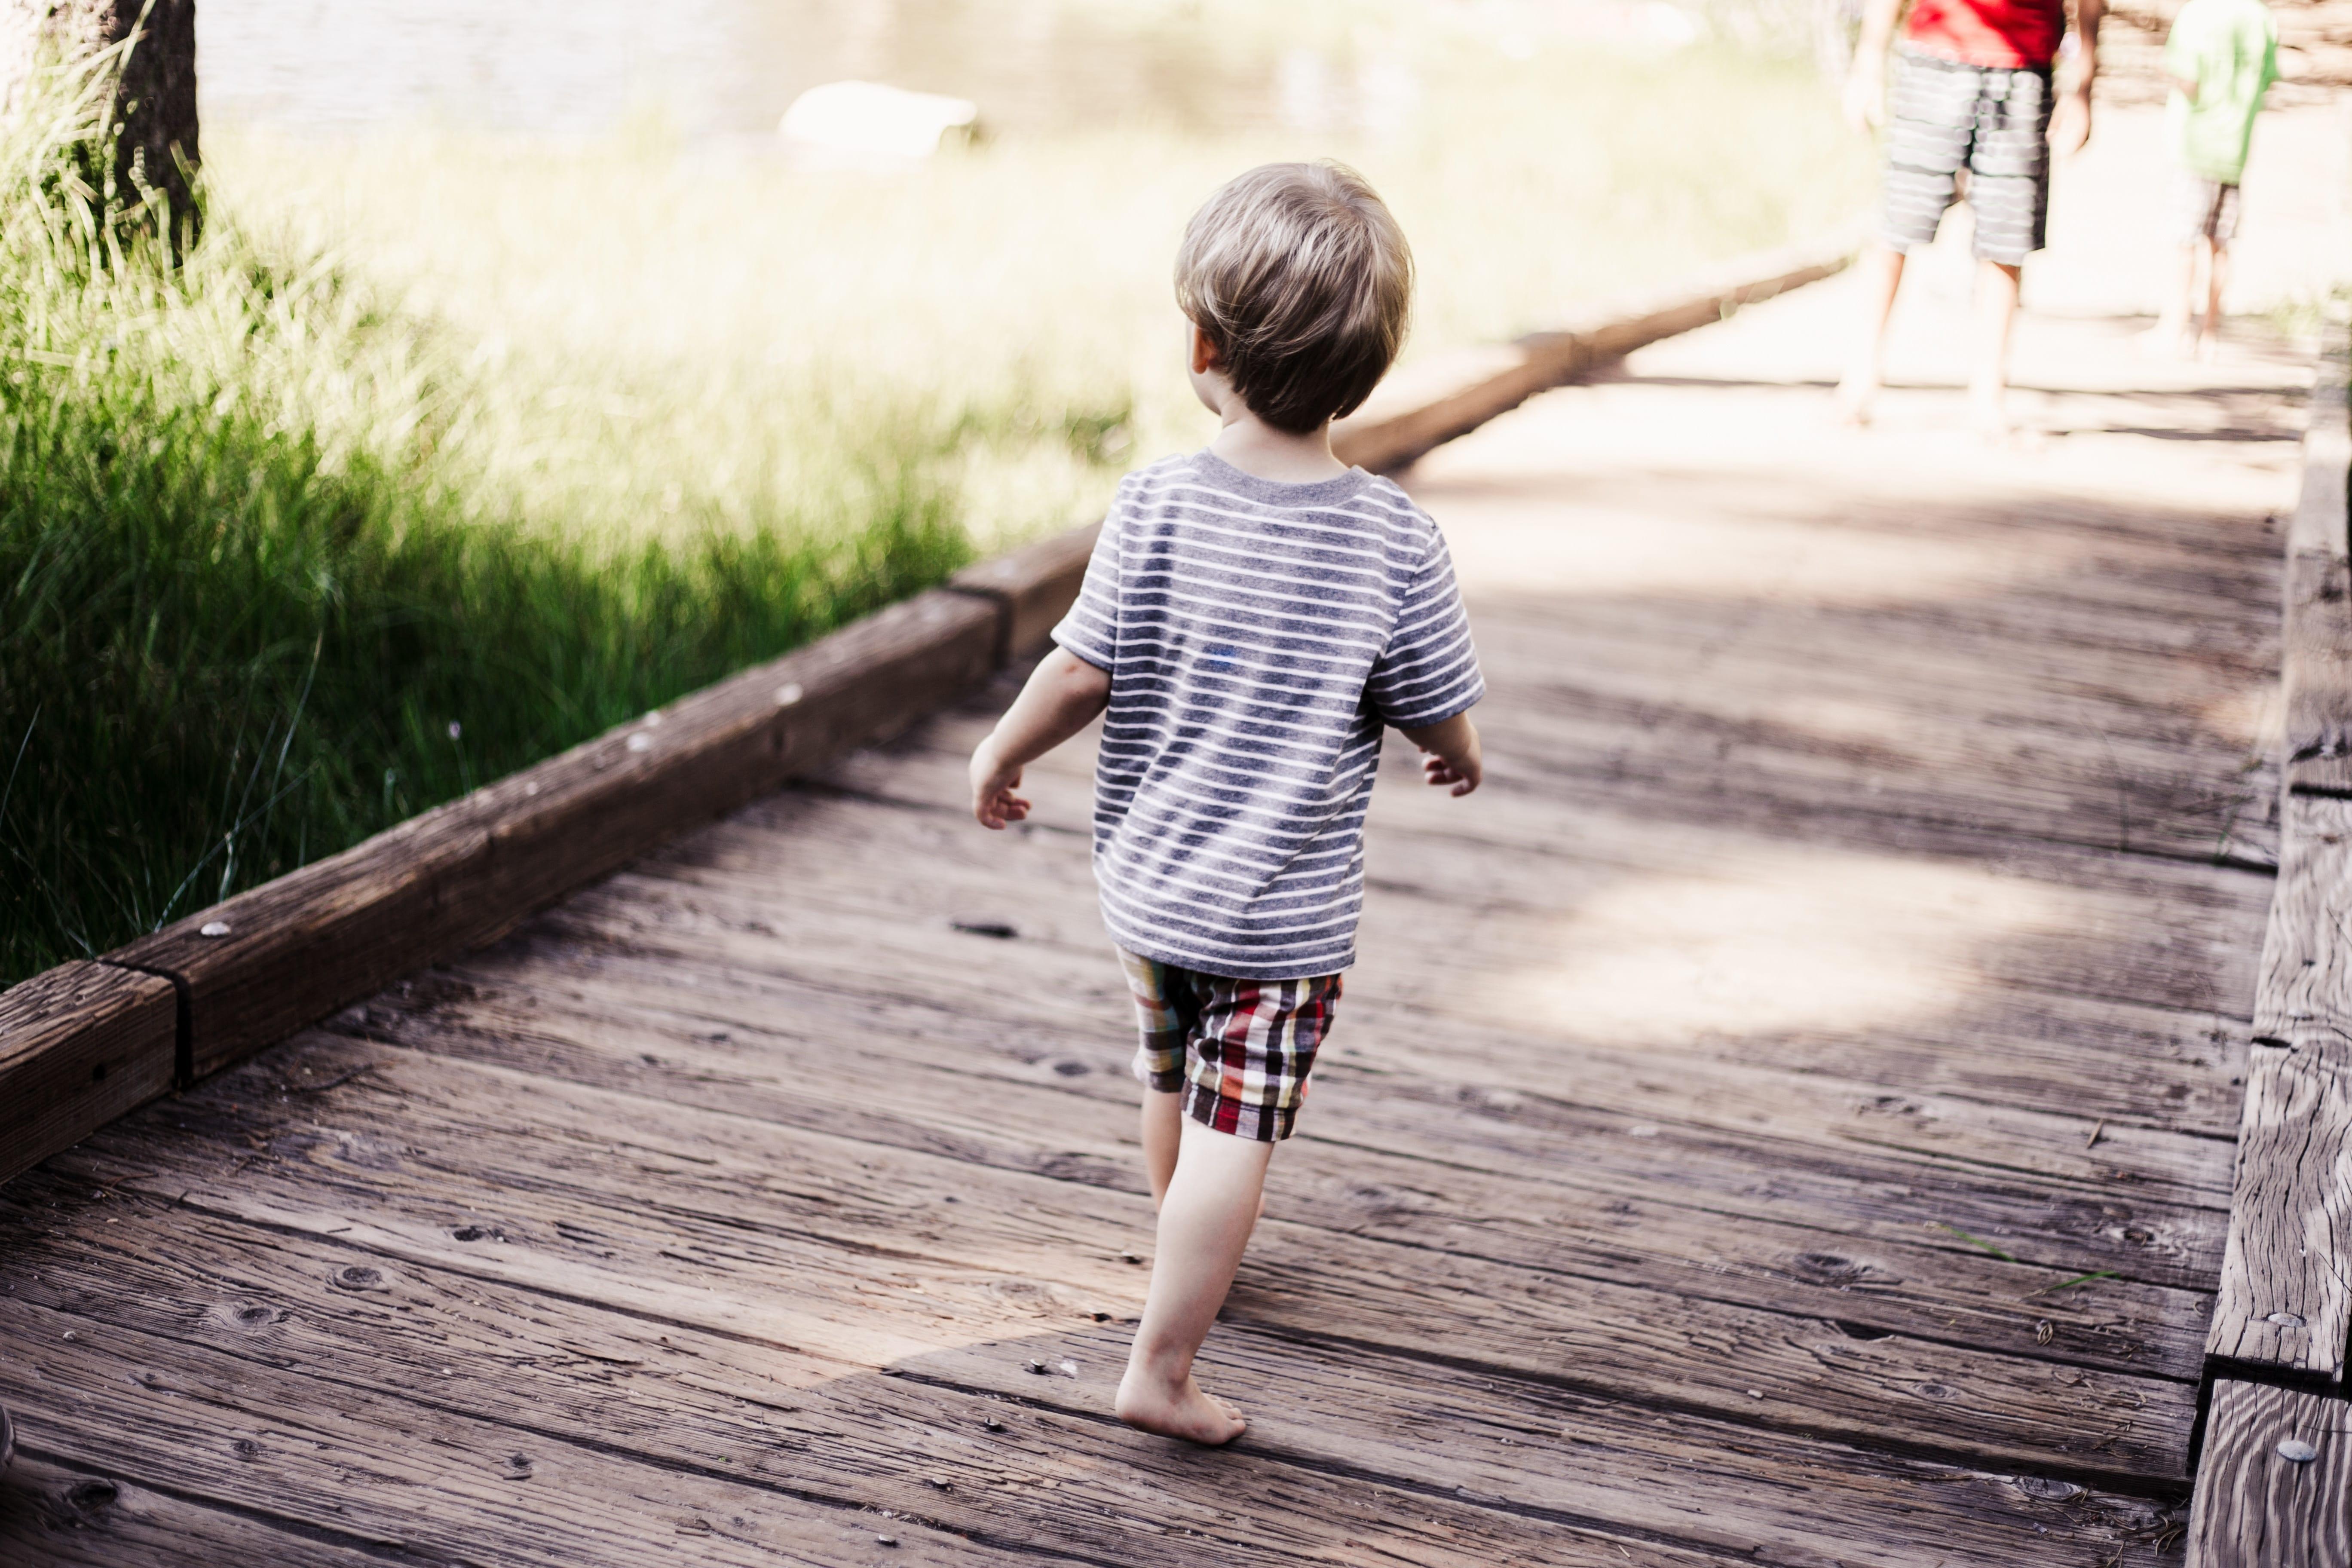 Young boy walking on bridge; image by Japhet Mast, via Unsplash.com.